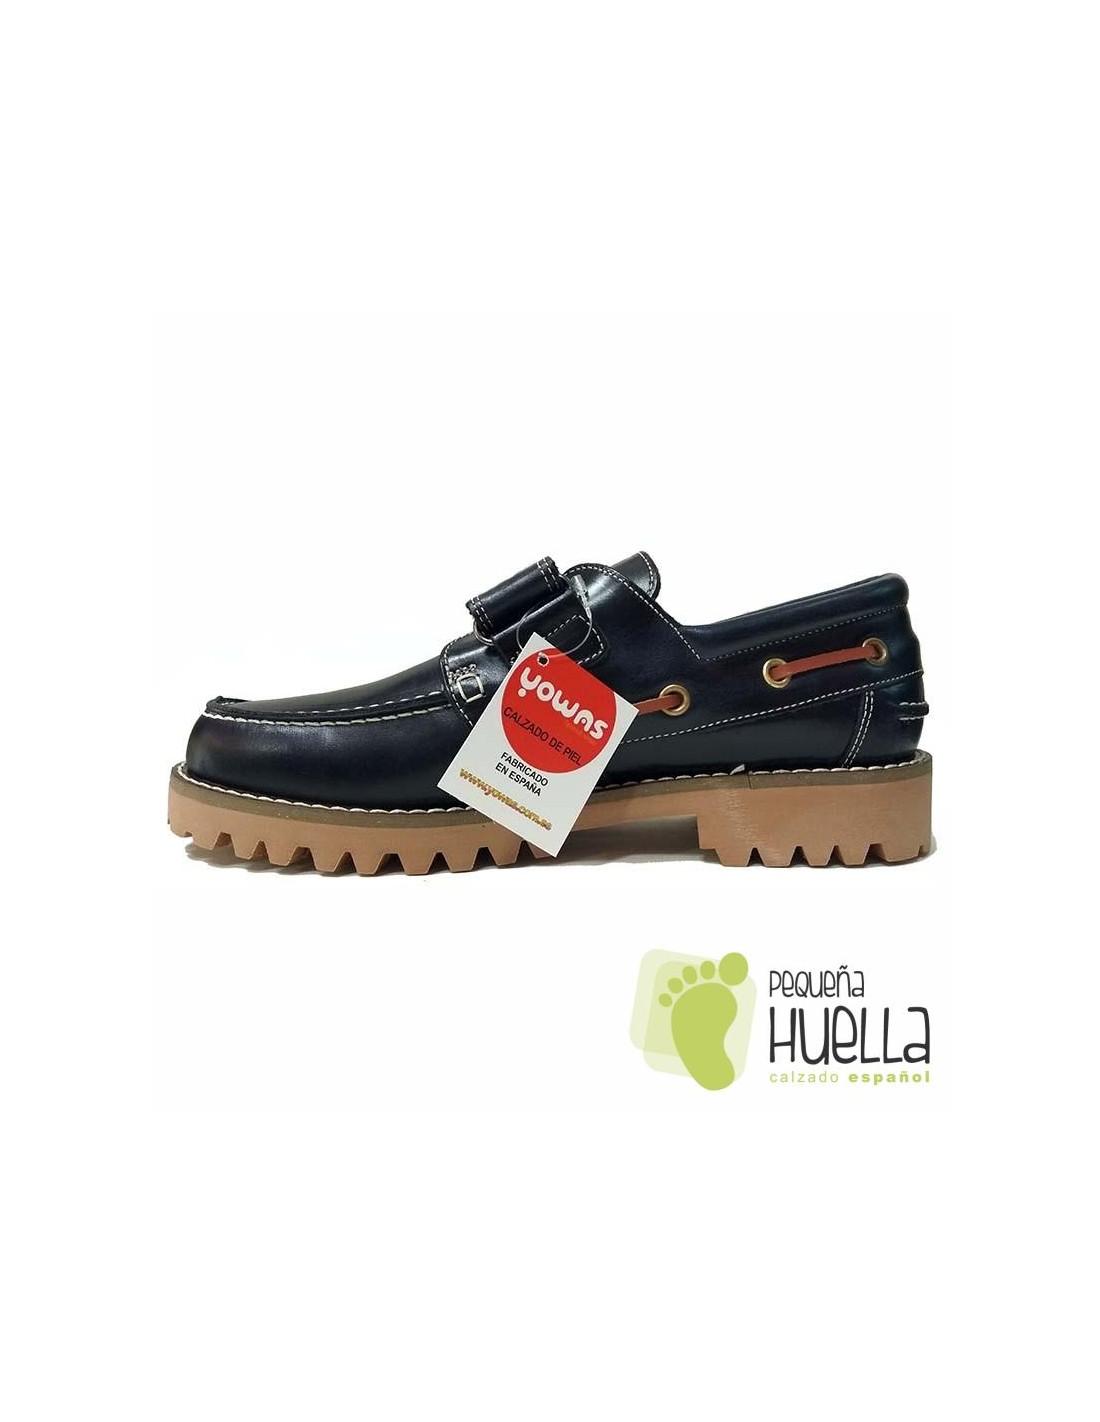 852e82bc9 Comprar Náuticos Niñas Zapatos Velcro Yowas Online Y Con Niños Para wCr6Bqw